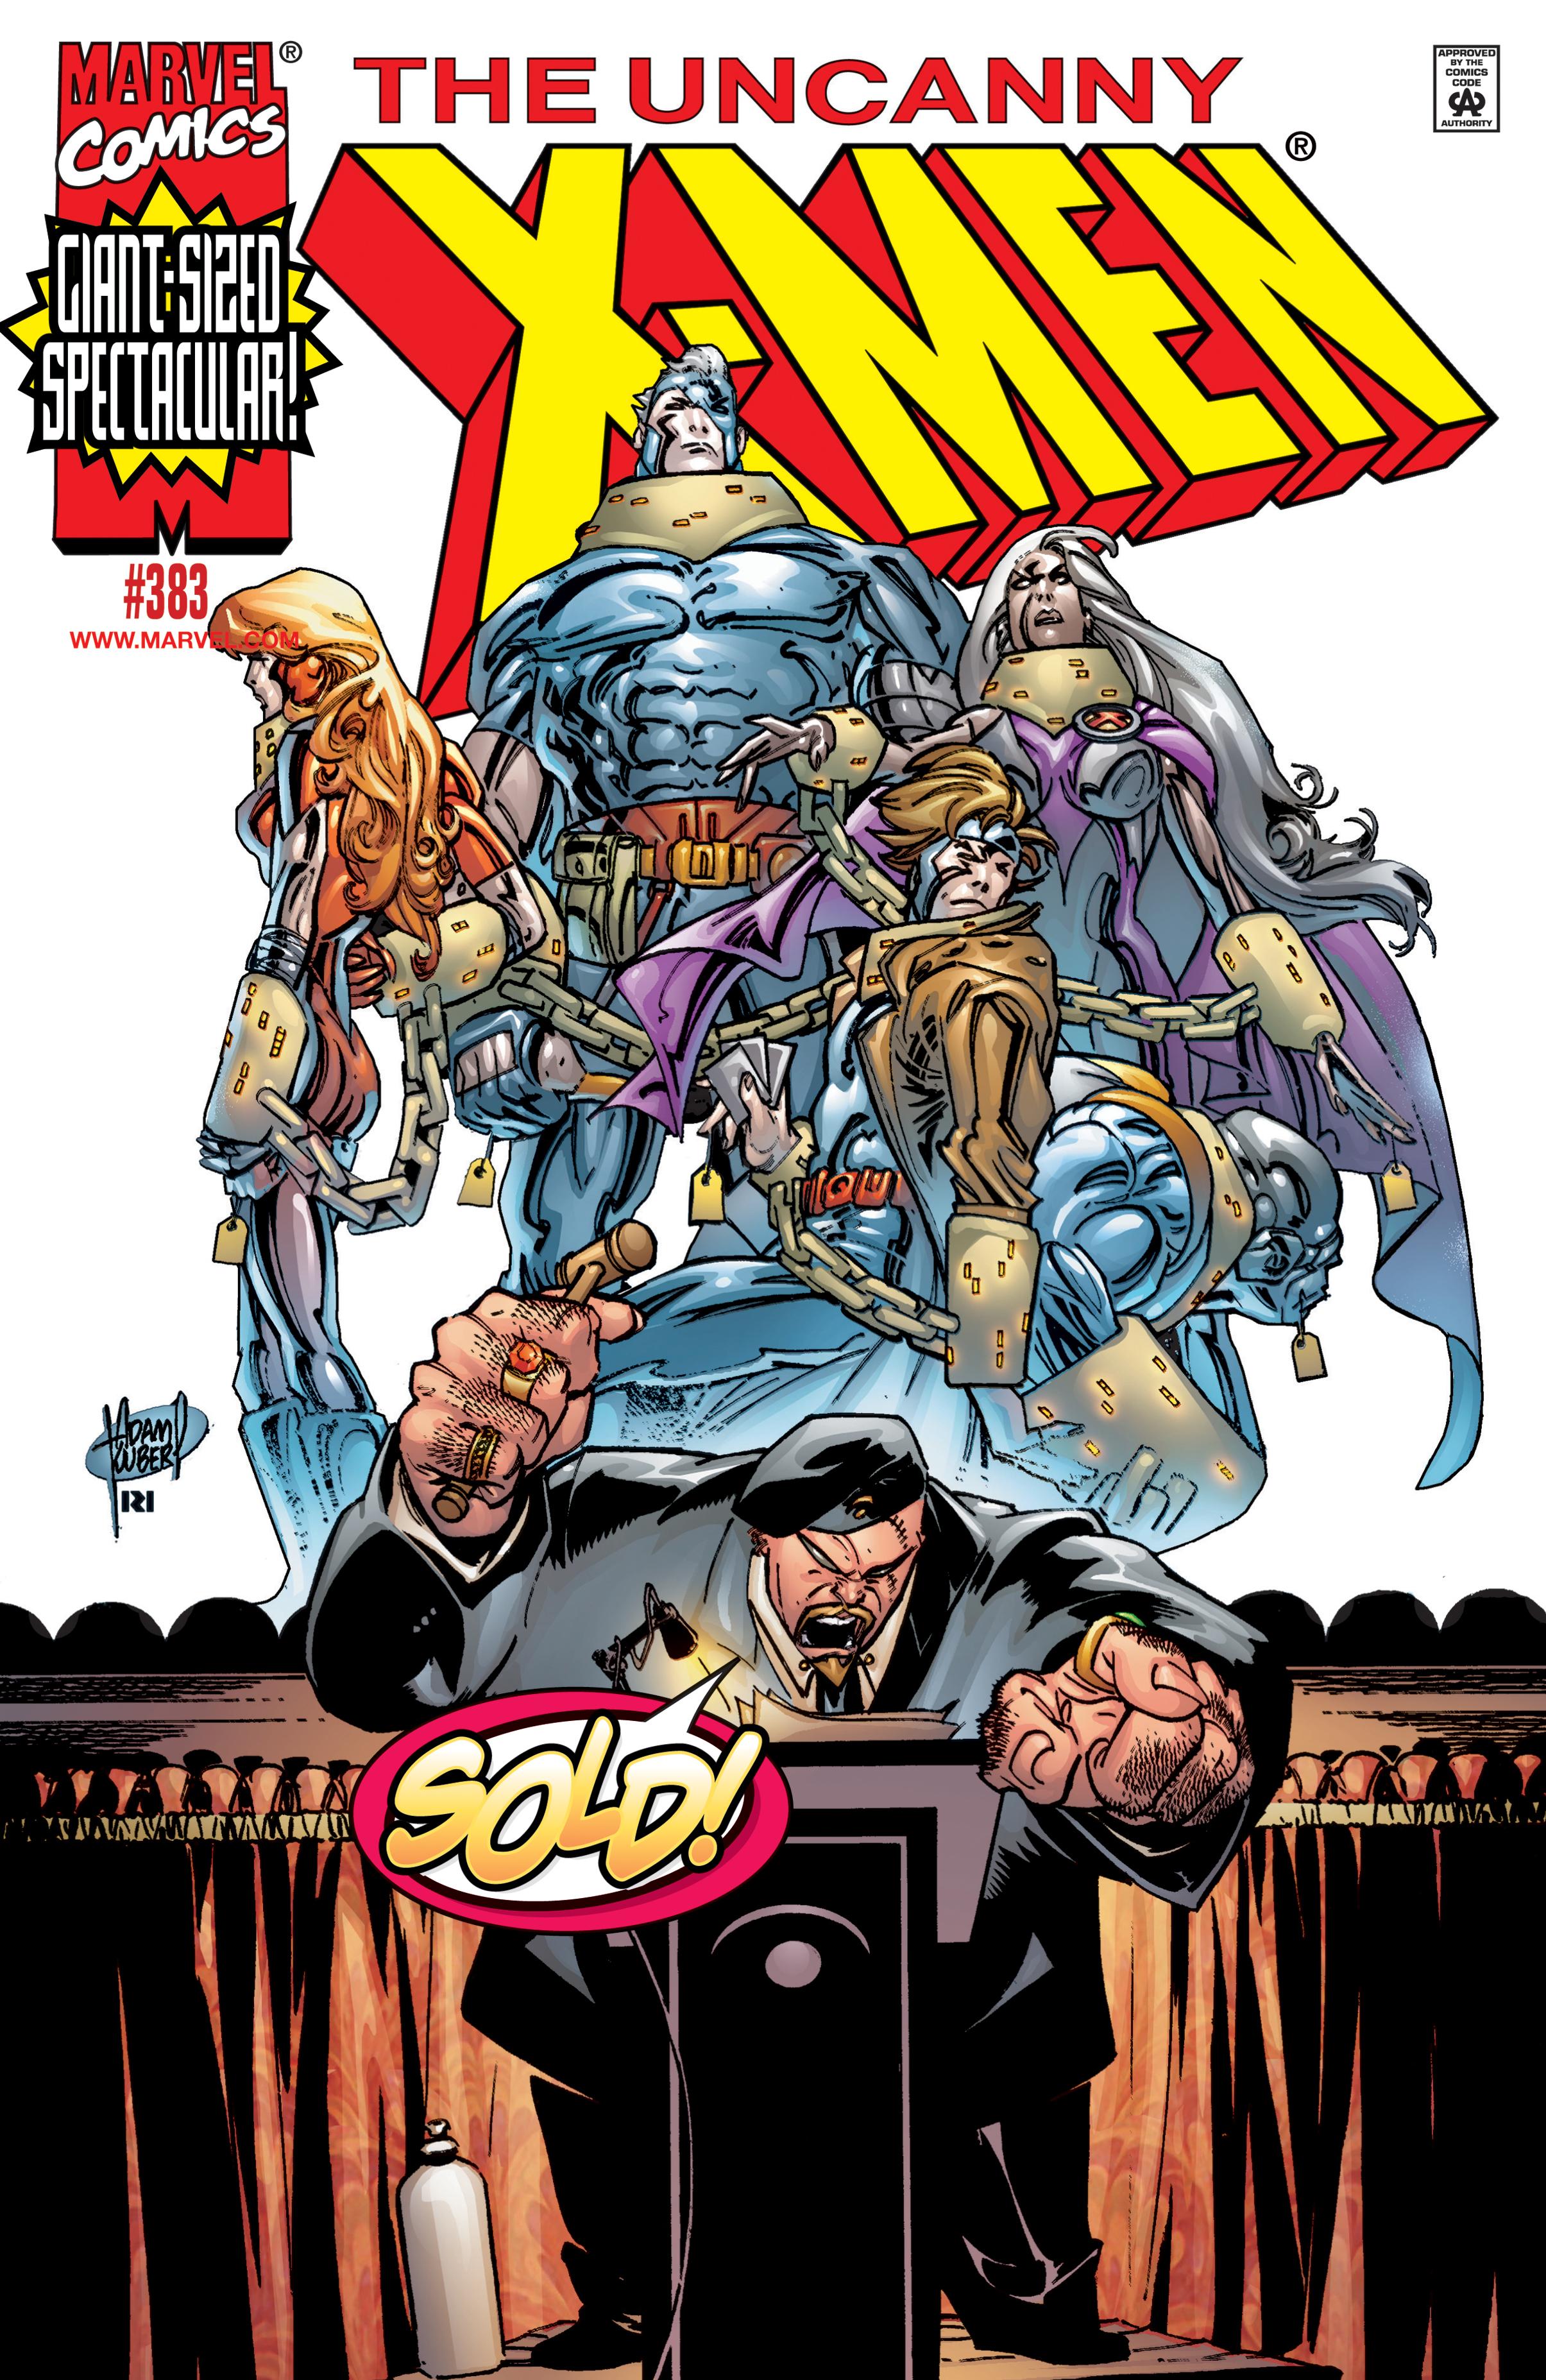 Uncanny X-Men (1963) #383